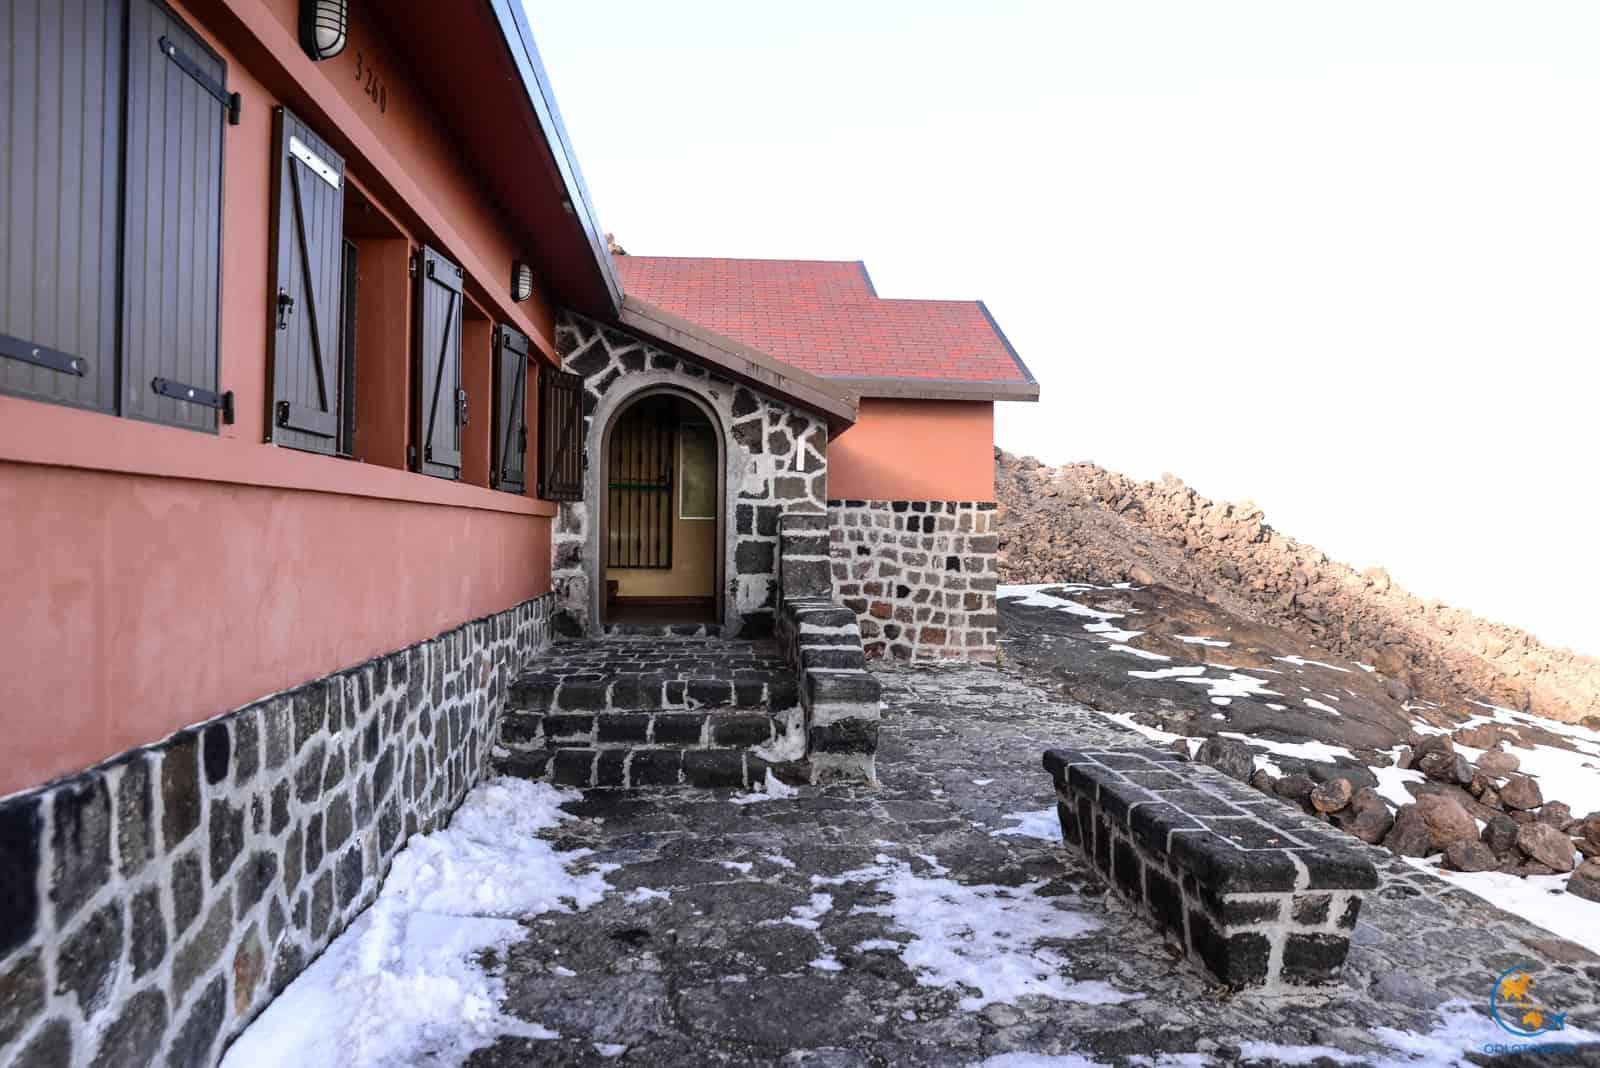 Schronisko Altavista | Altavista del Teide Refuge